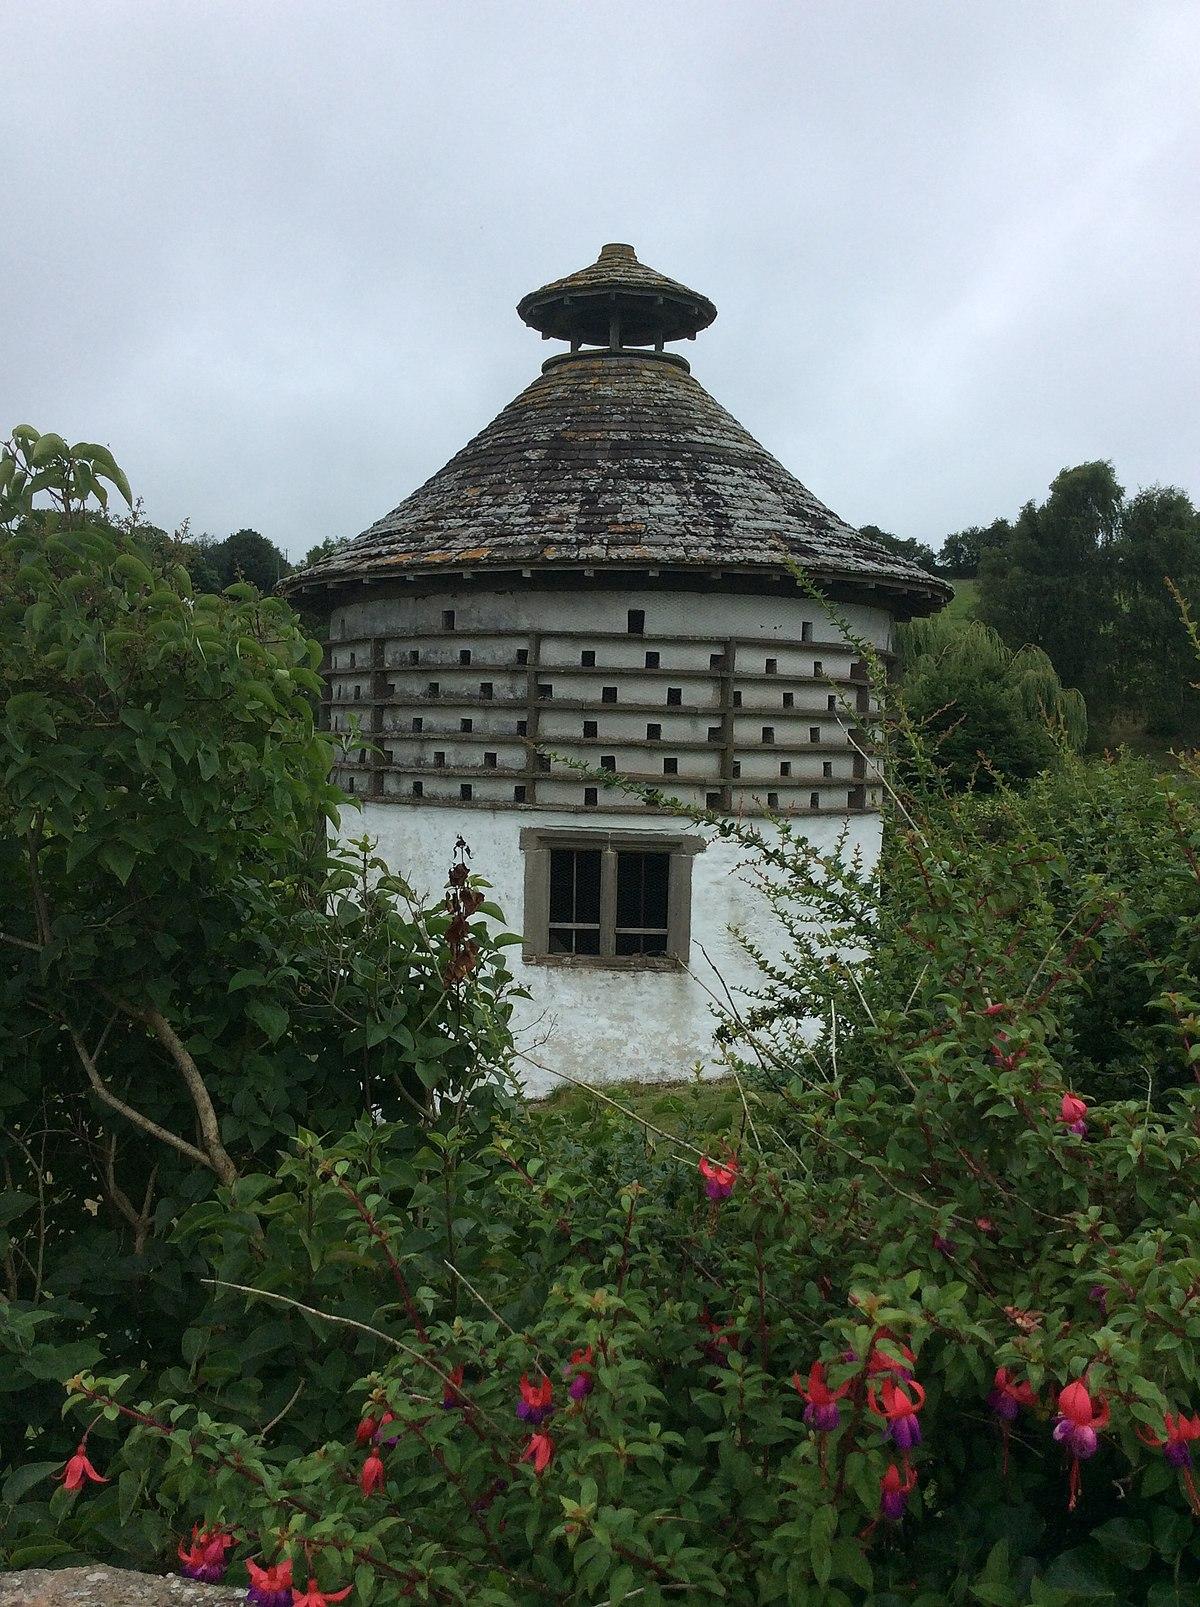 Hygga House Dovecote Trellech Wikipedia